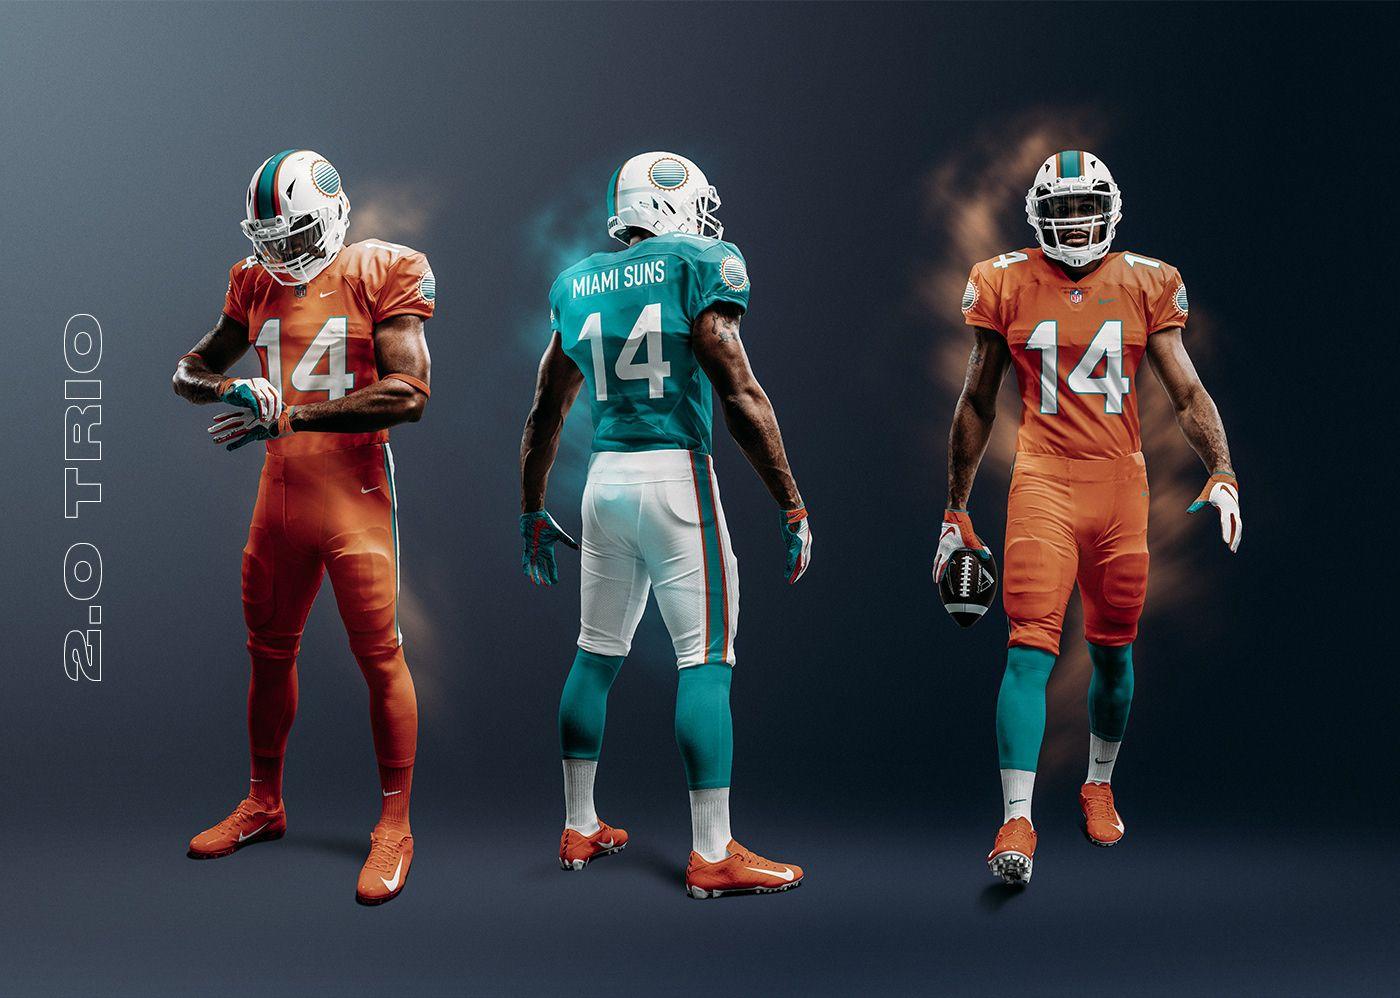 Download 2 0 Nfl Football Mockups Free Psd On Behance Nfl Outfits Nfl Football Free Mockup